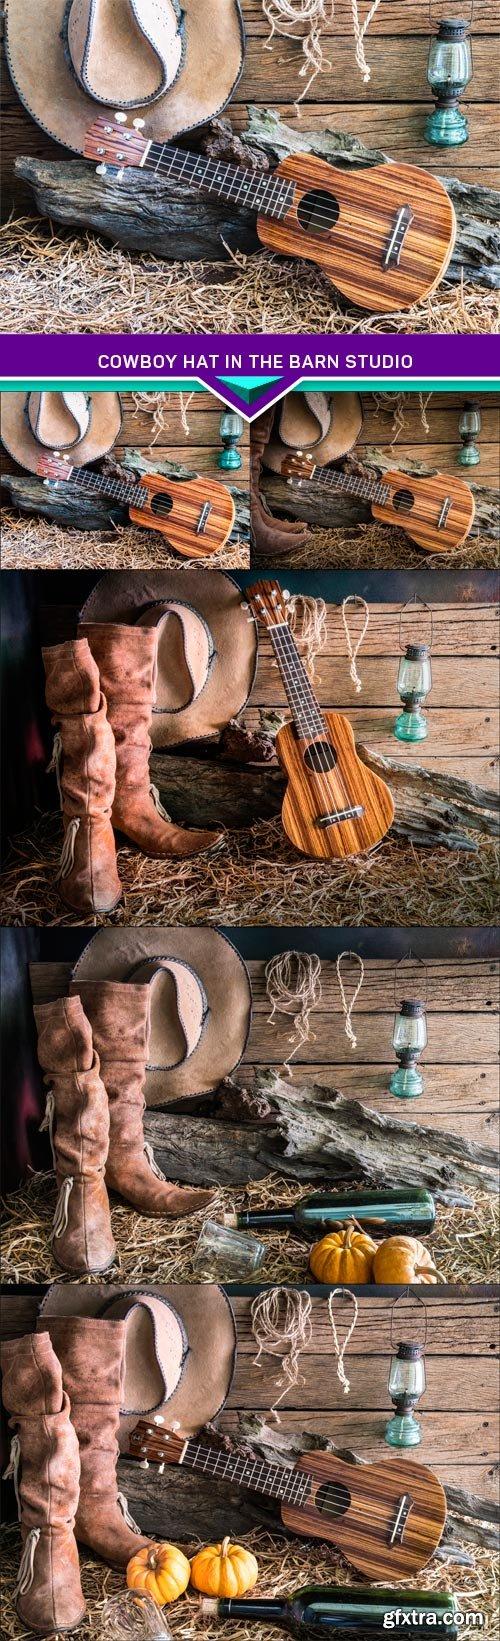 Cowboy hat in the barn studio 5X JPEG